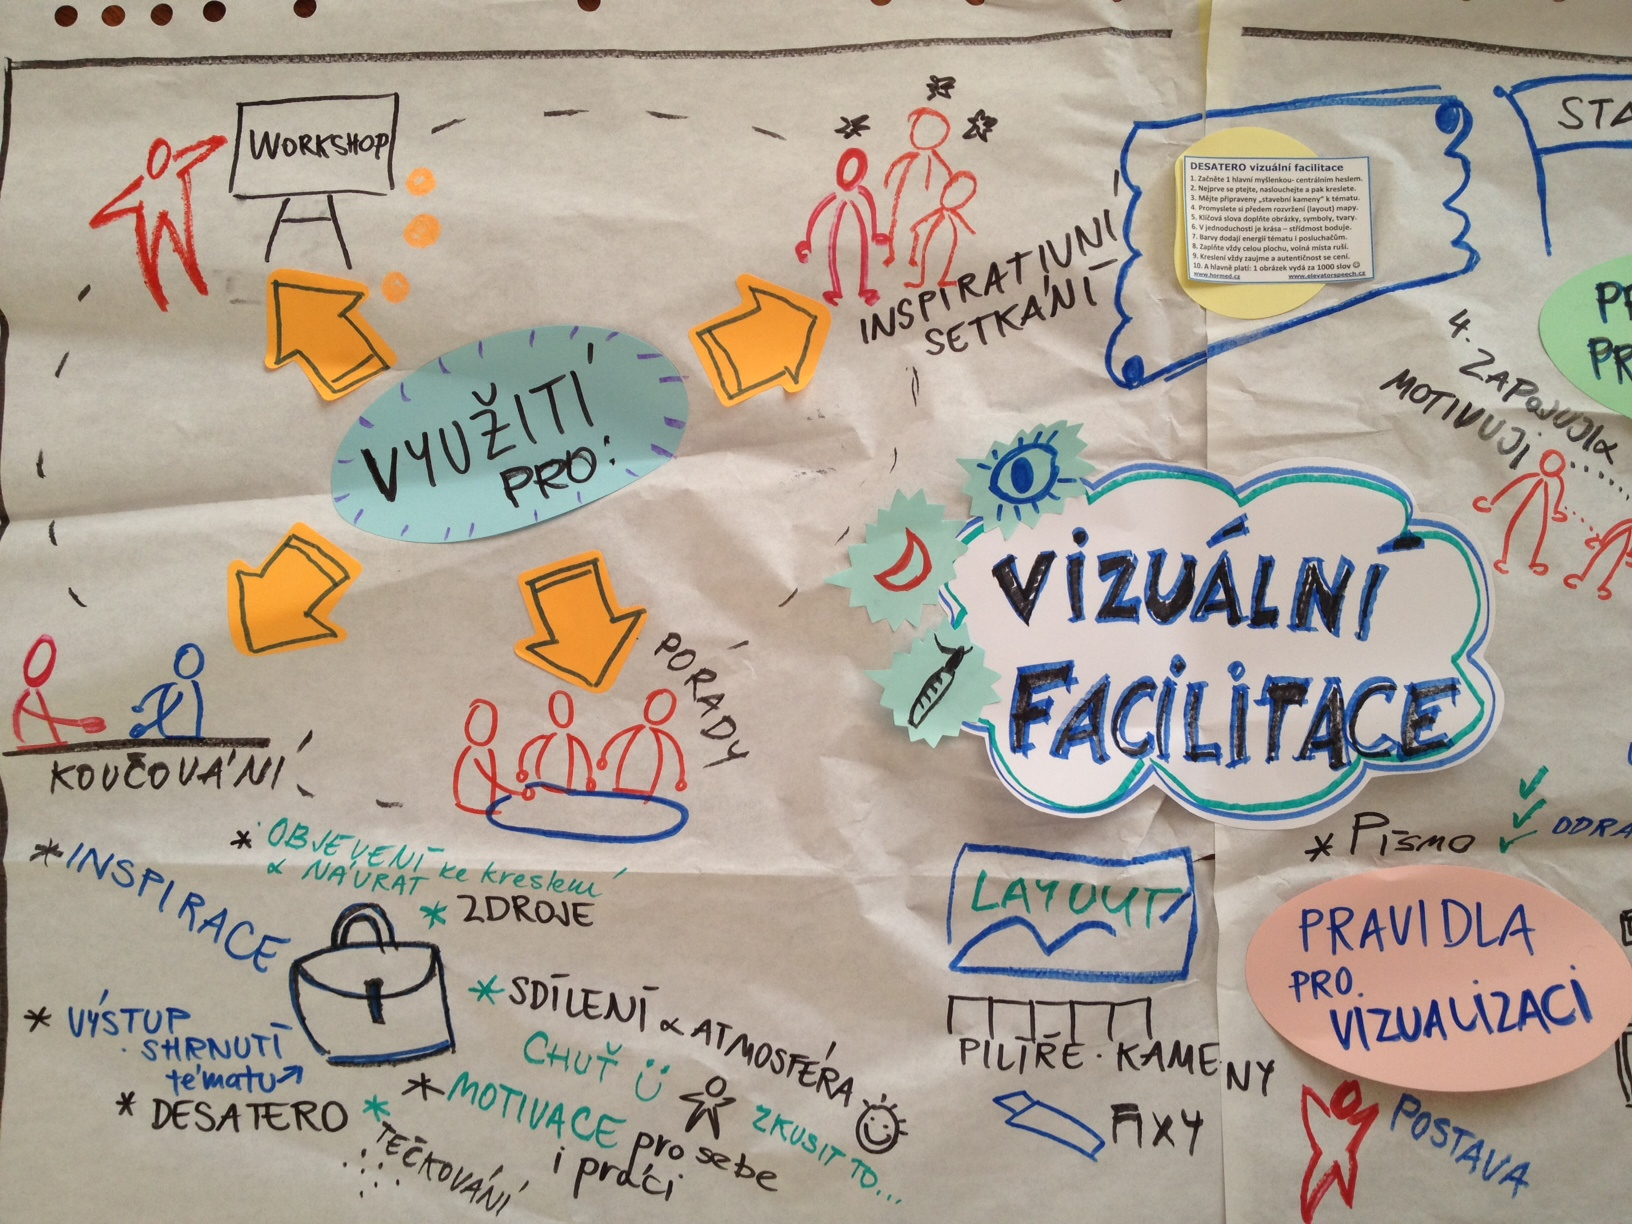 Prinosy_vizual_facilitace_mapa